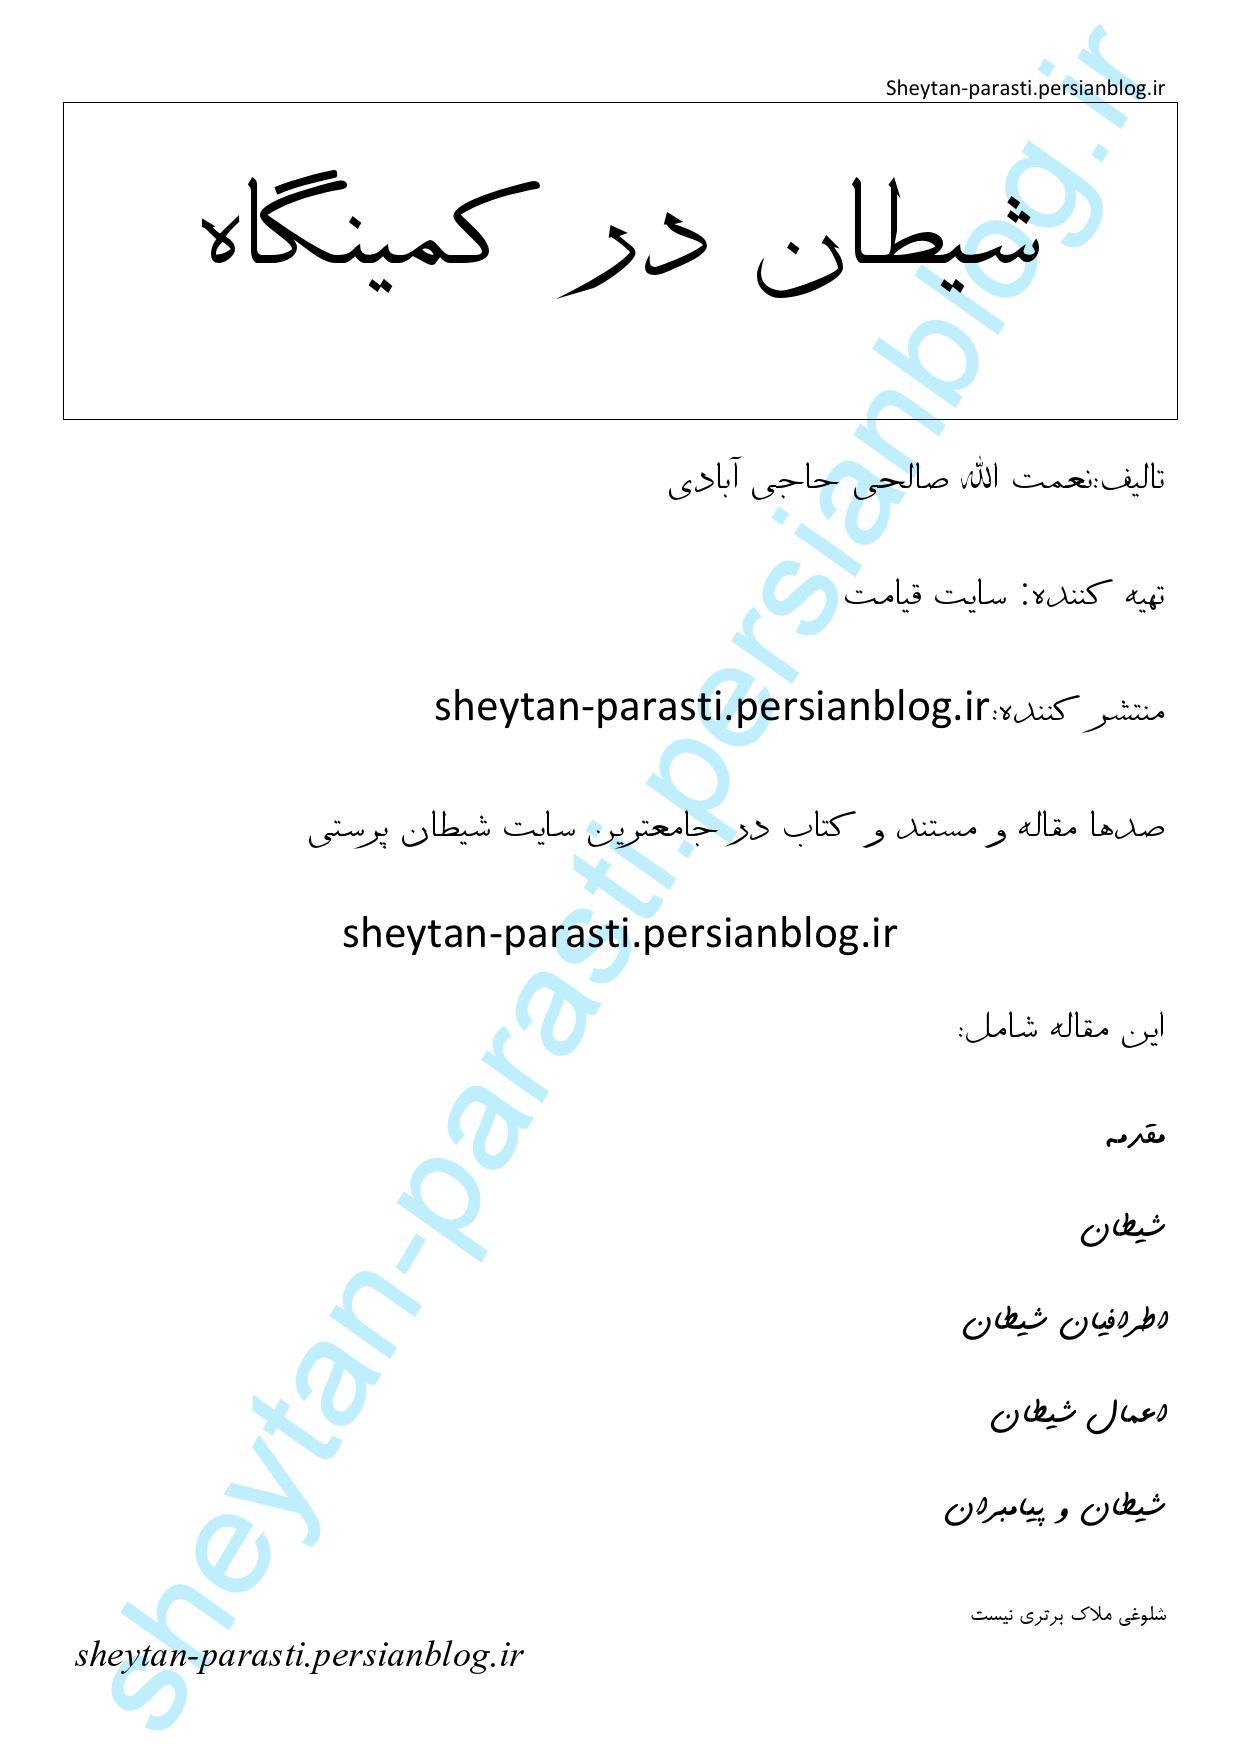 sheytan_dar_kamingah_000001